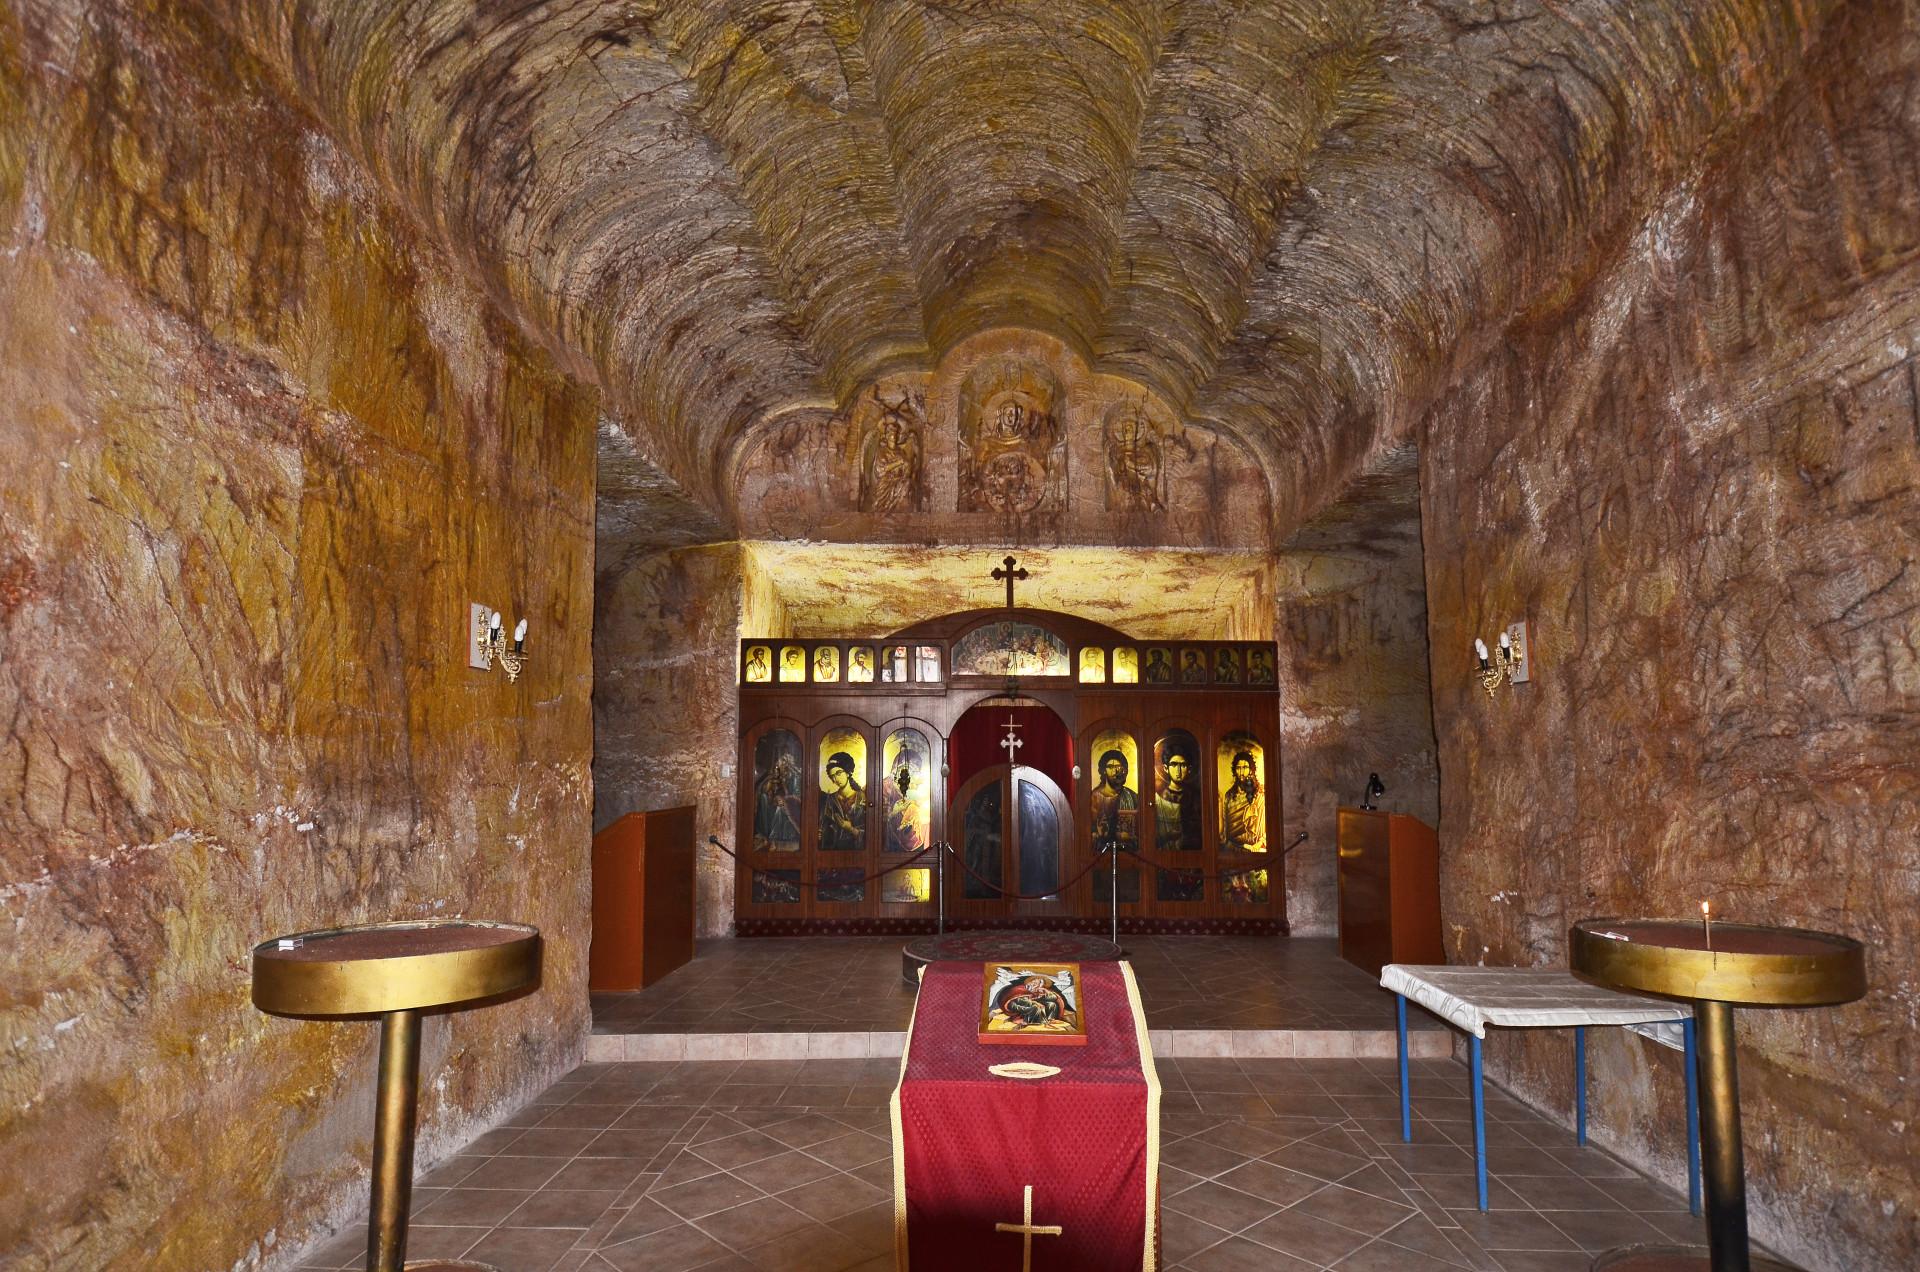 Underground: Inside the weird and wonderful world of Coober Pedy